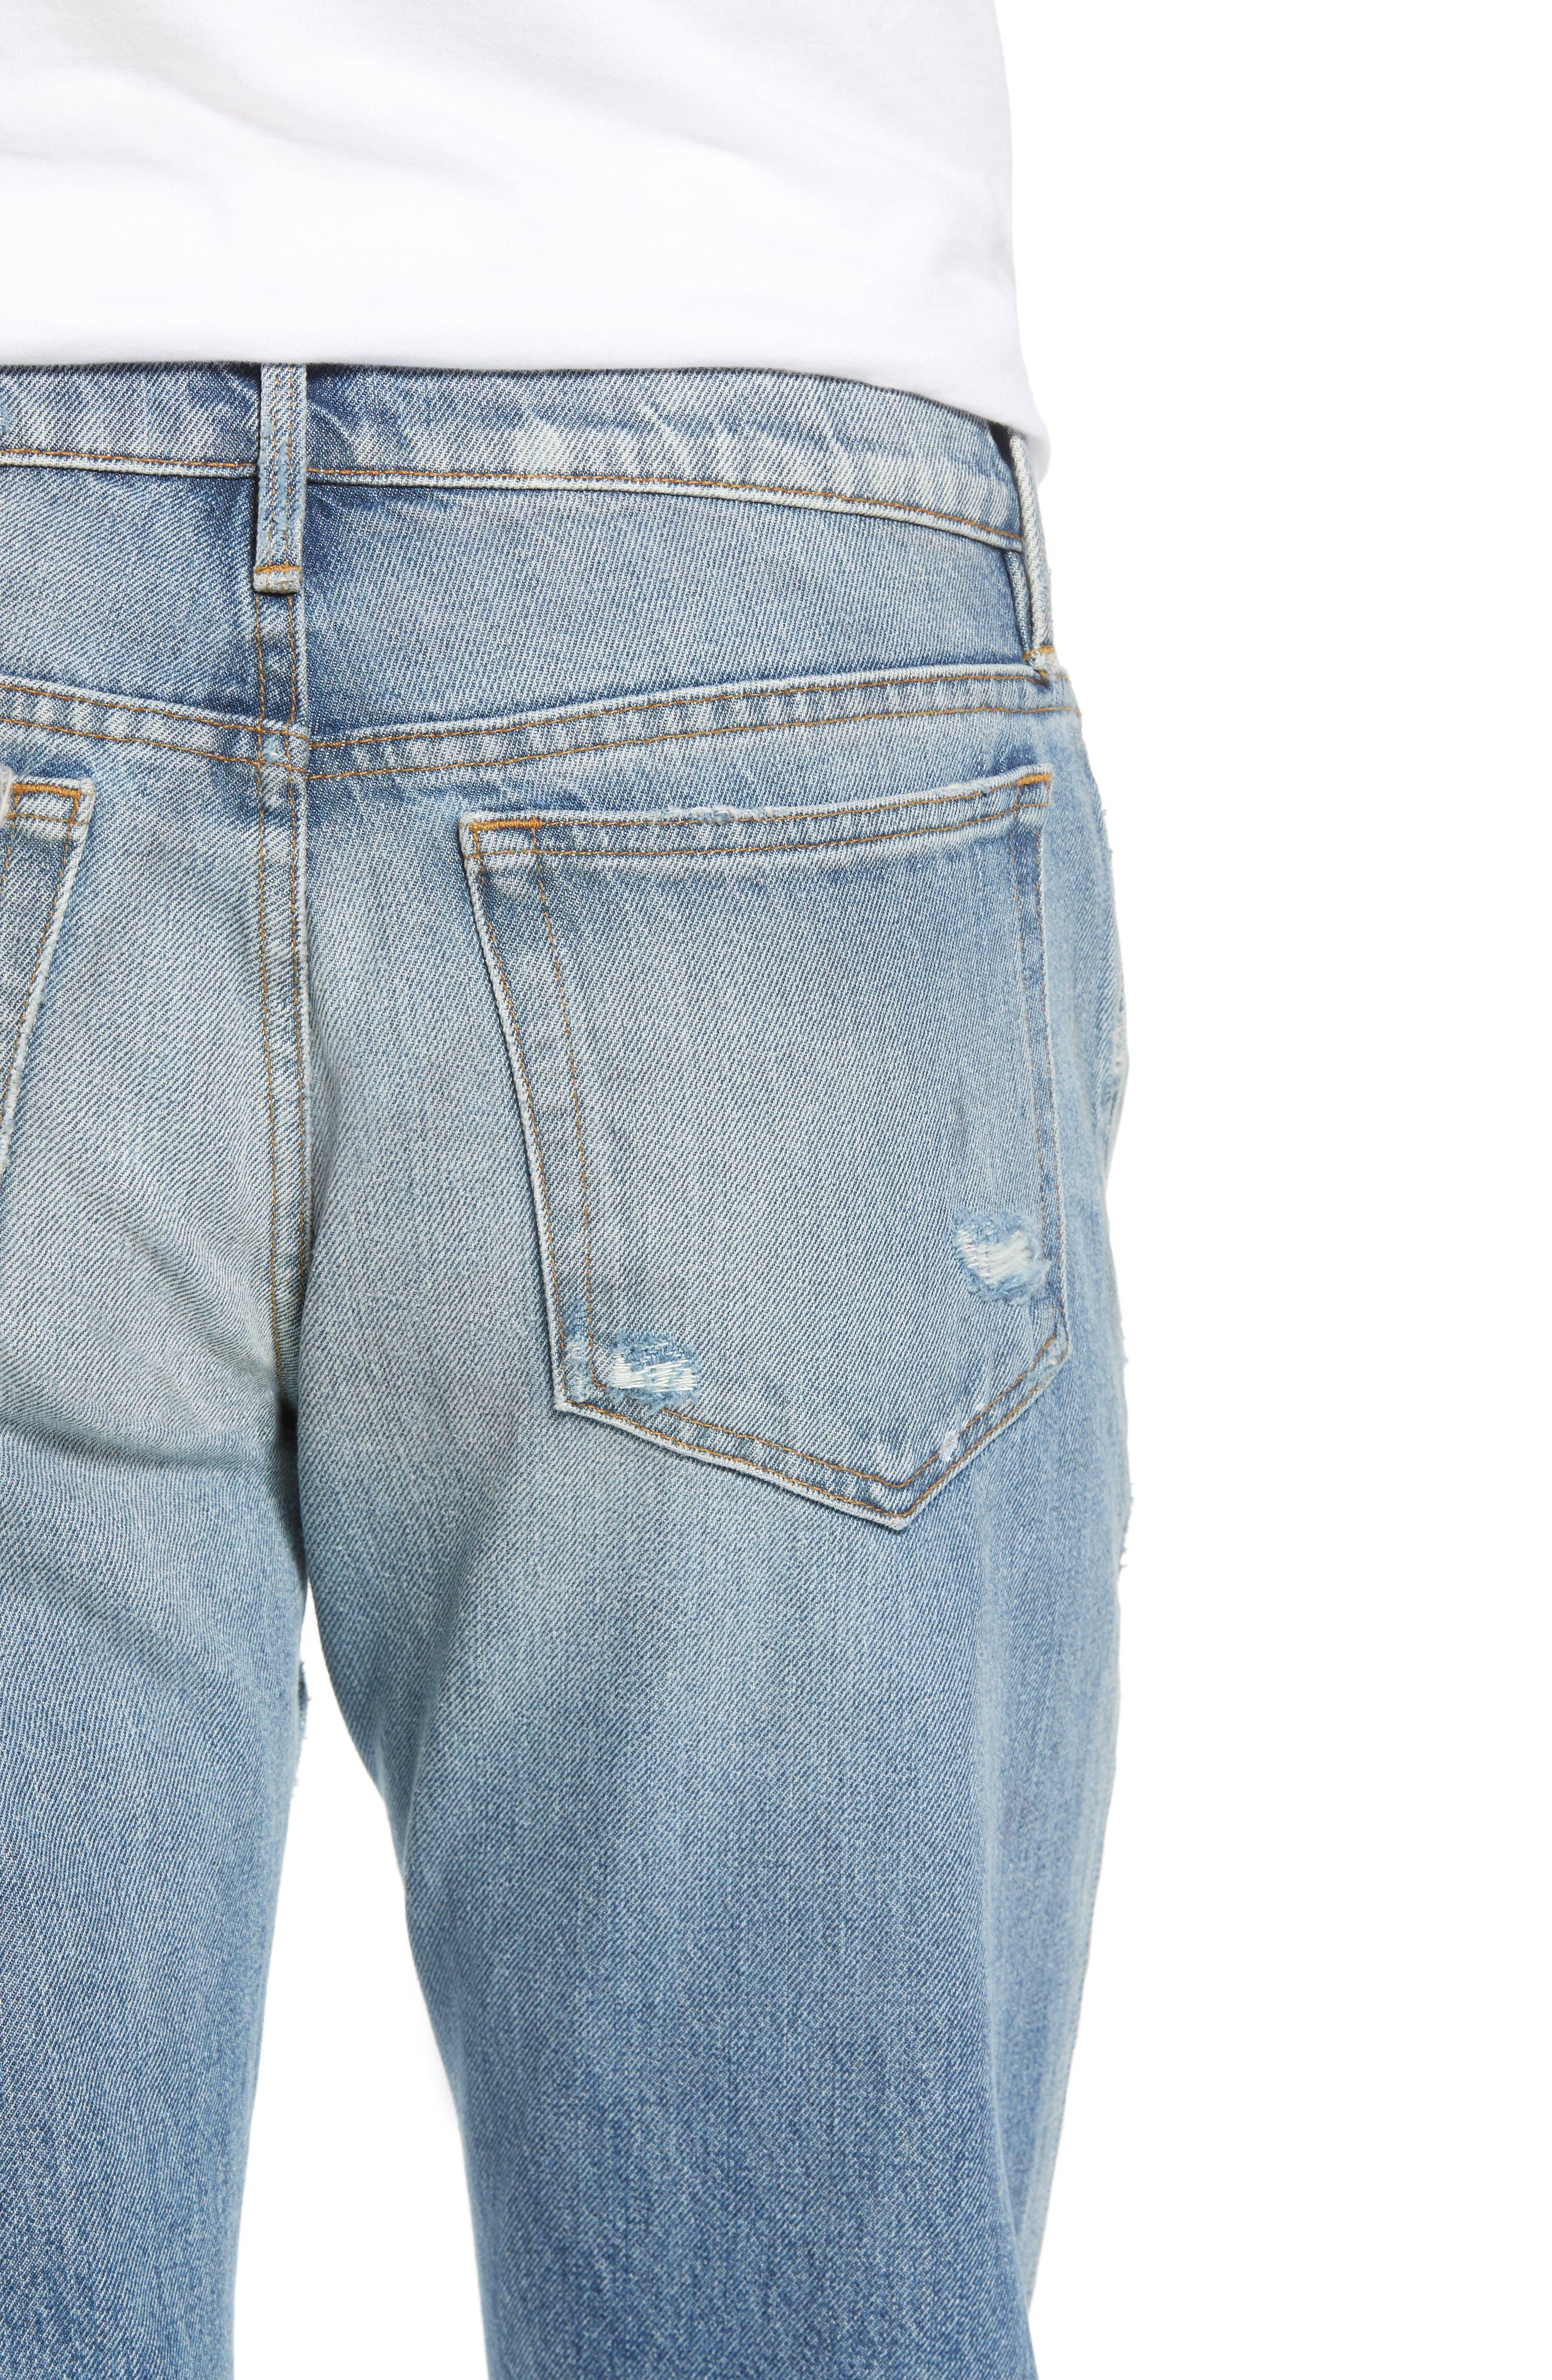 L'Homme Slim Fit Jeans,                             Alternate thumbnail 4, color,                             Bizworth